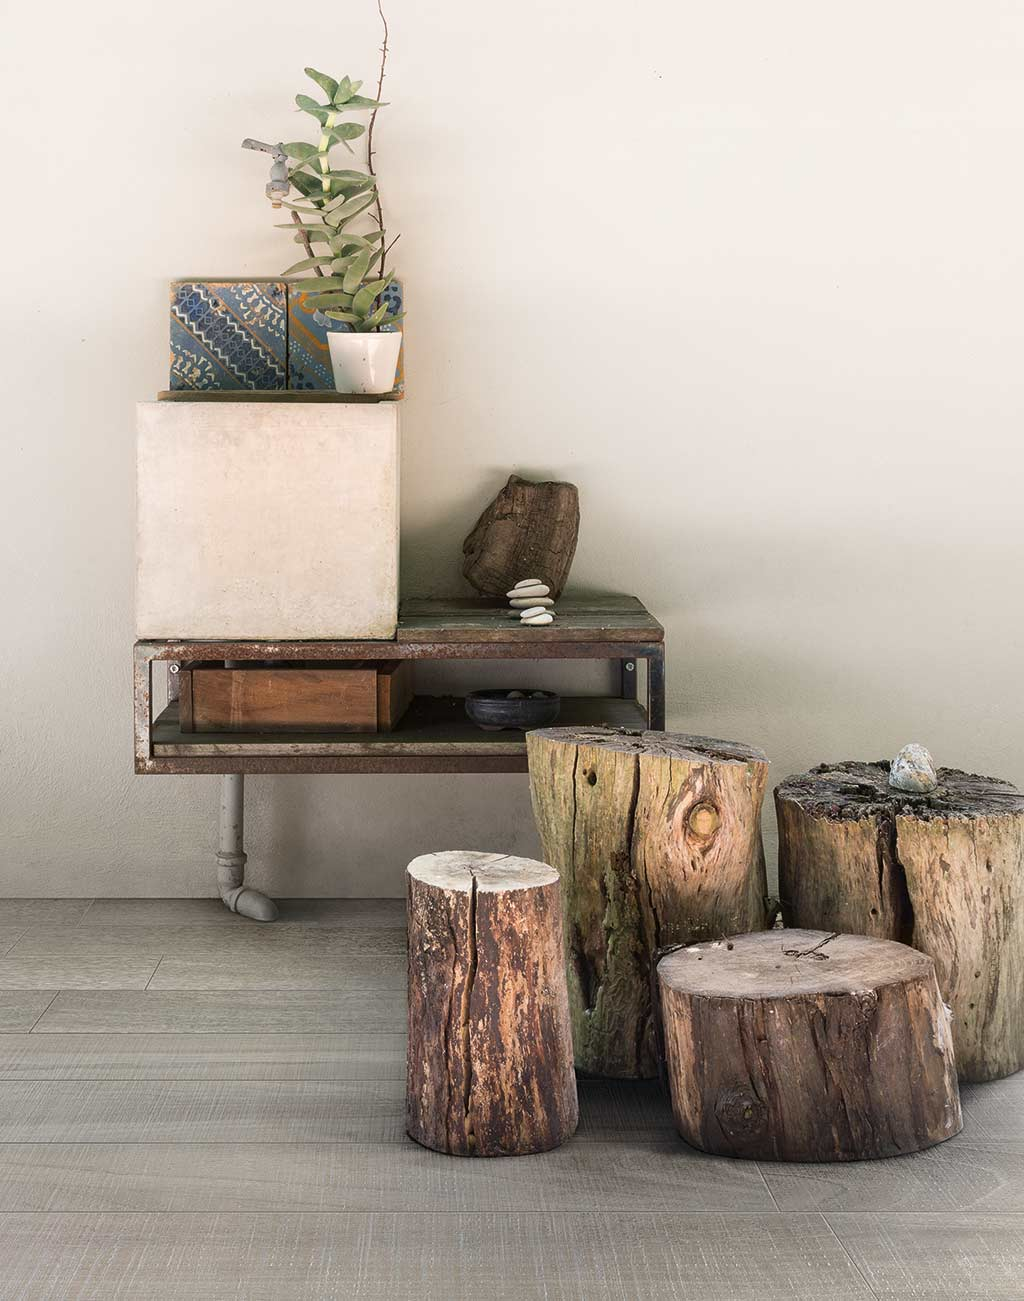 Casa-dolce-casa-wooden-tile_portfolio-1